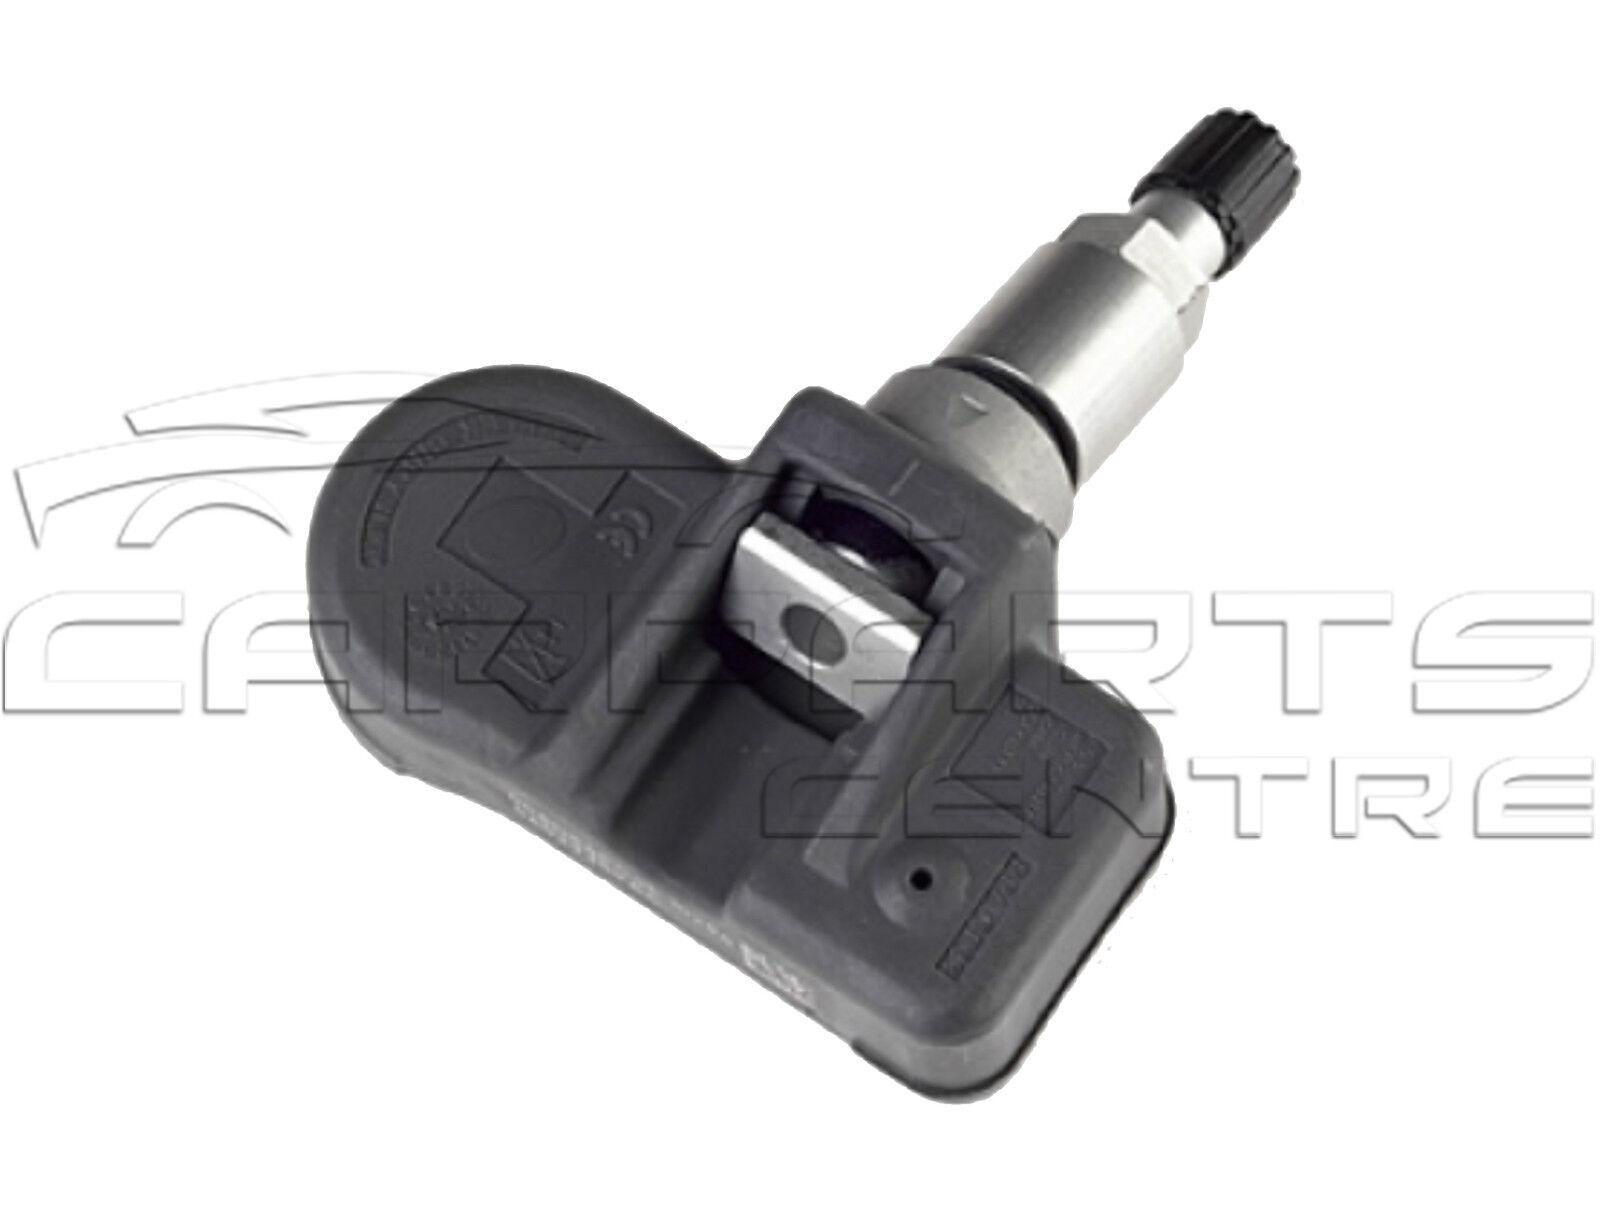 Citroen C4 C5 C6 C8 Wheel Tyre Low Pressure Sensor 5430T4